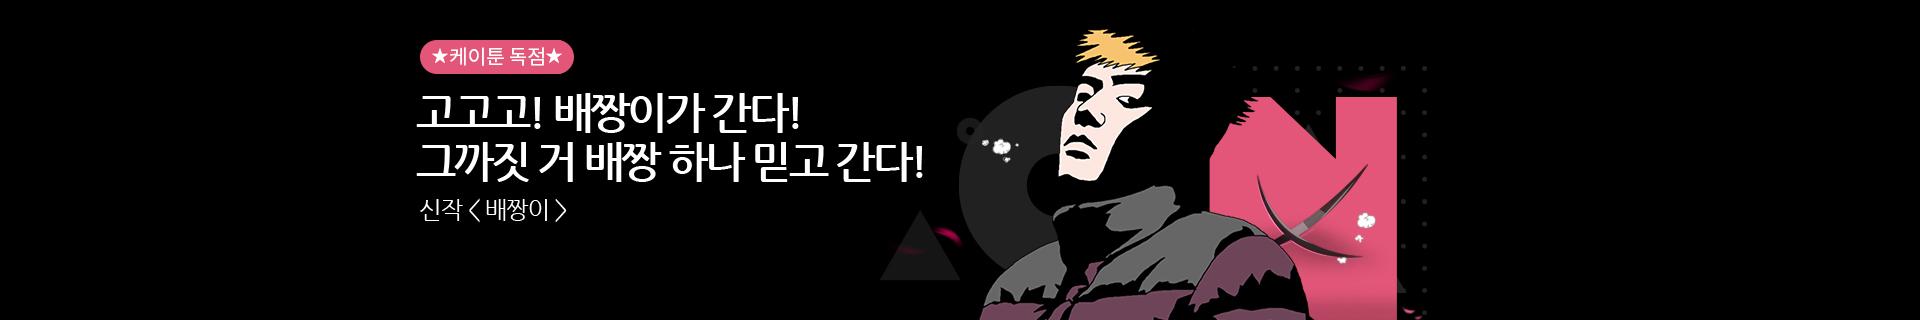 PC_sub_bn_웹툰신작_배짱이_1920x320.jpg